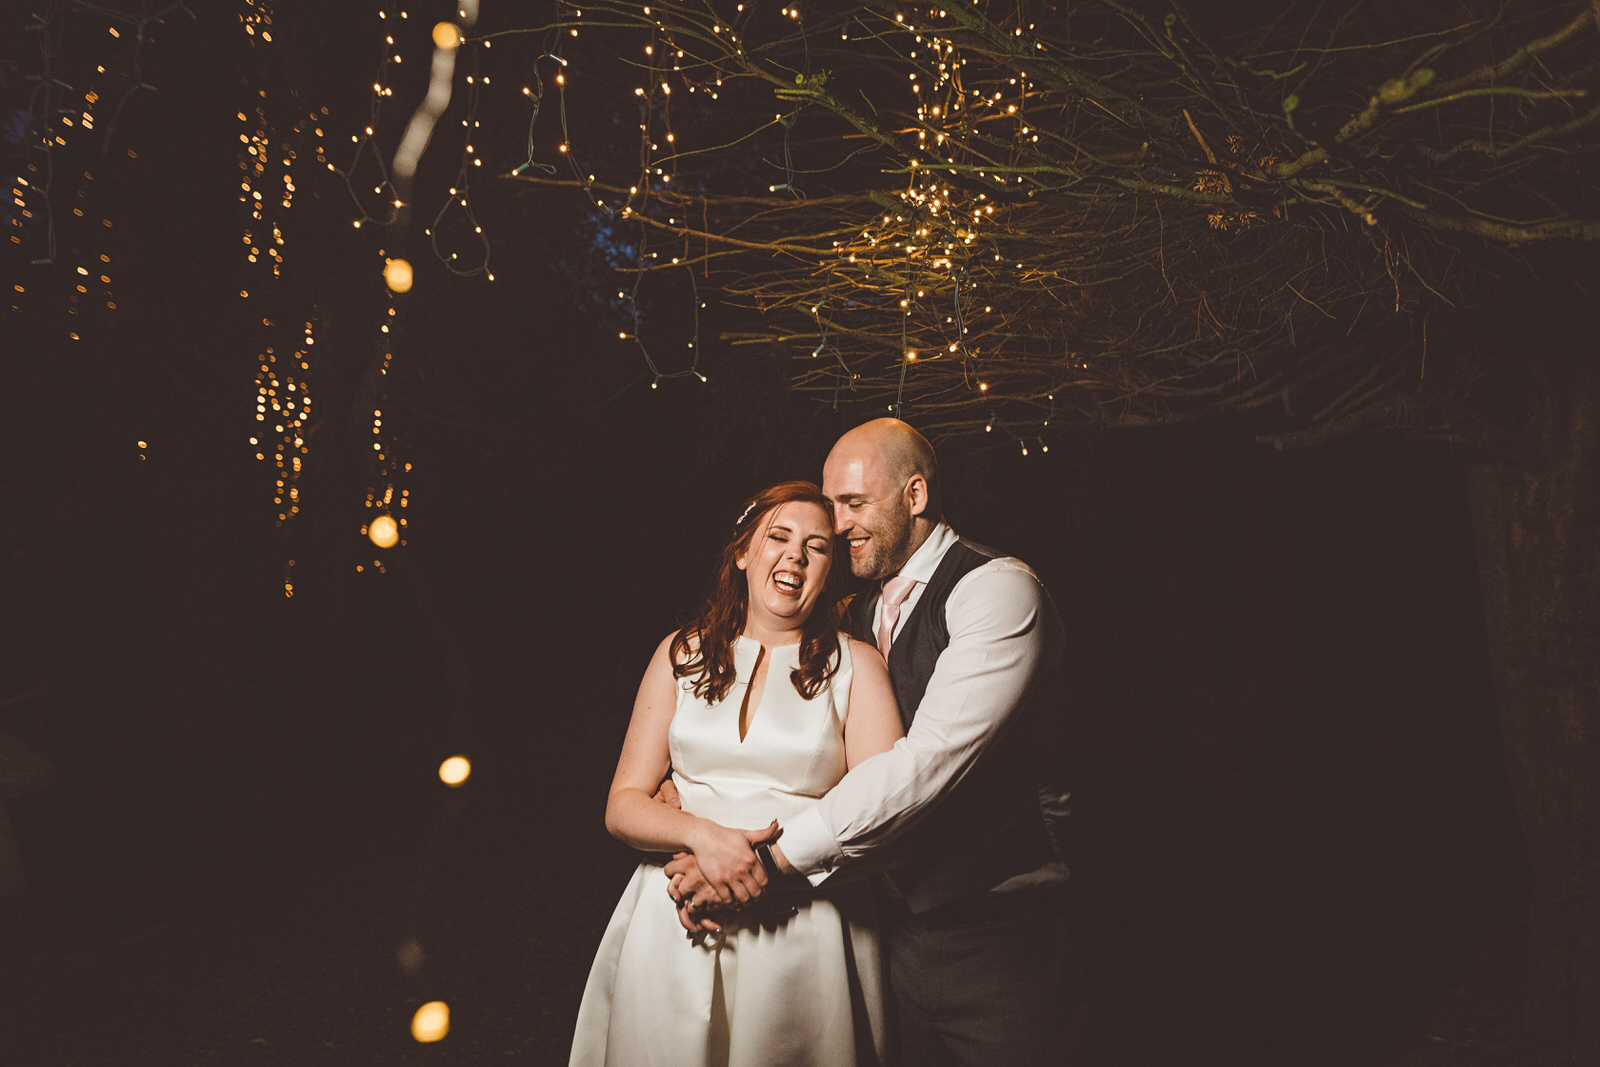 Beamish-Hall-Wedding-Photographer-068.jpg